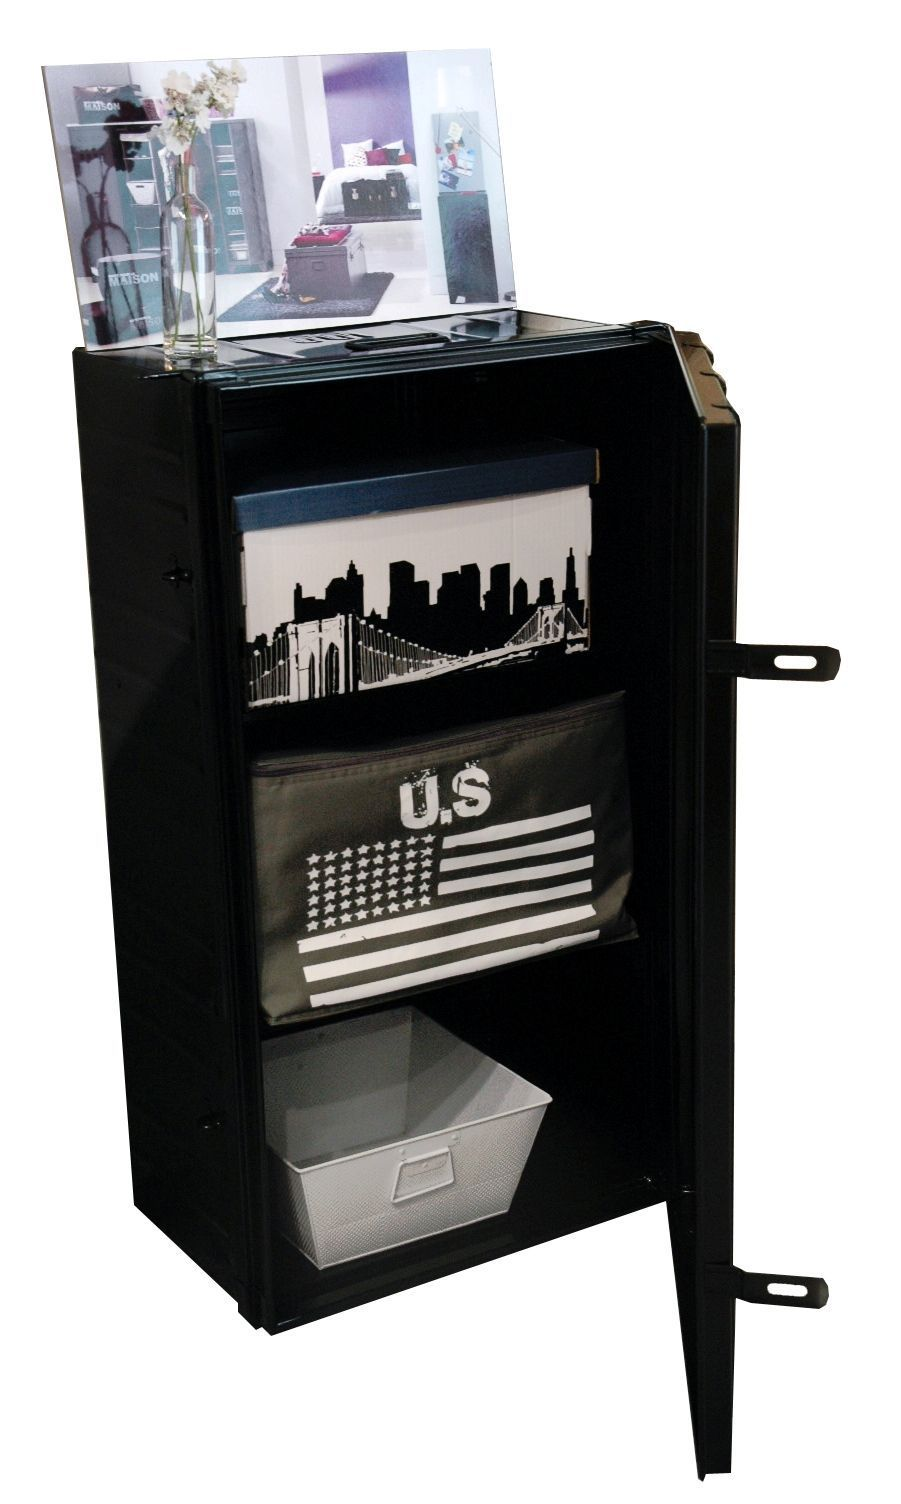 malle armoire en acier 2 en 1 ebay. Black Bedroom Furniture Sets. Home Design Ideas